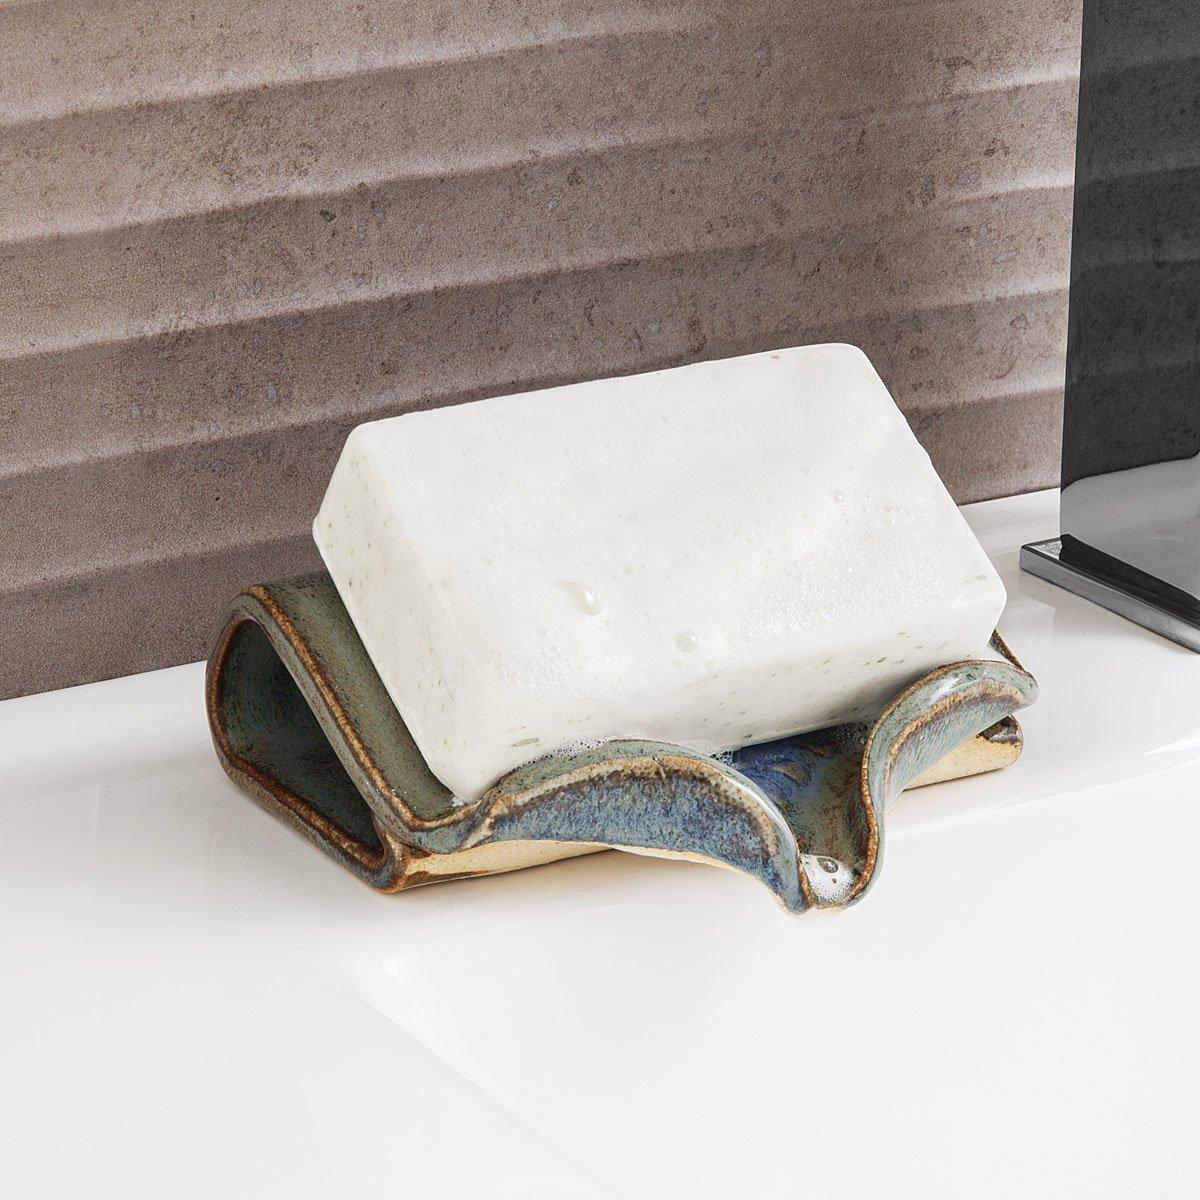 Ceramic Self Draining Soap Dish Handmade Bathroom Decor